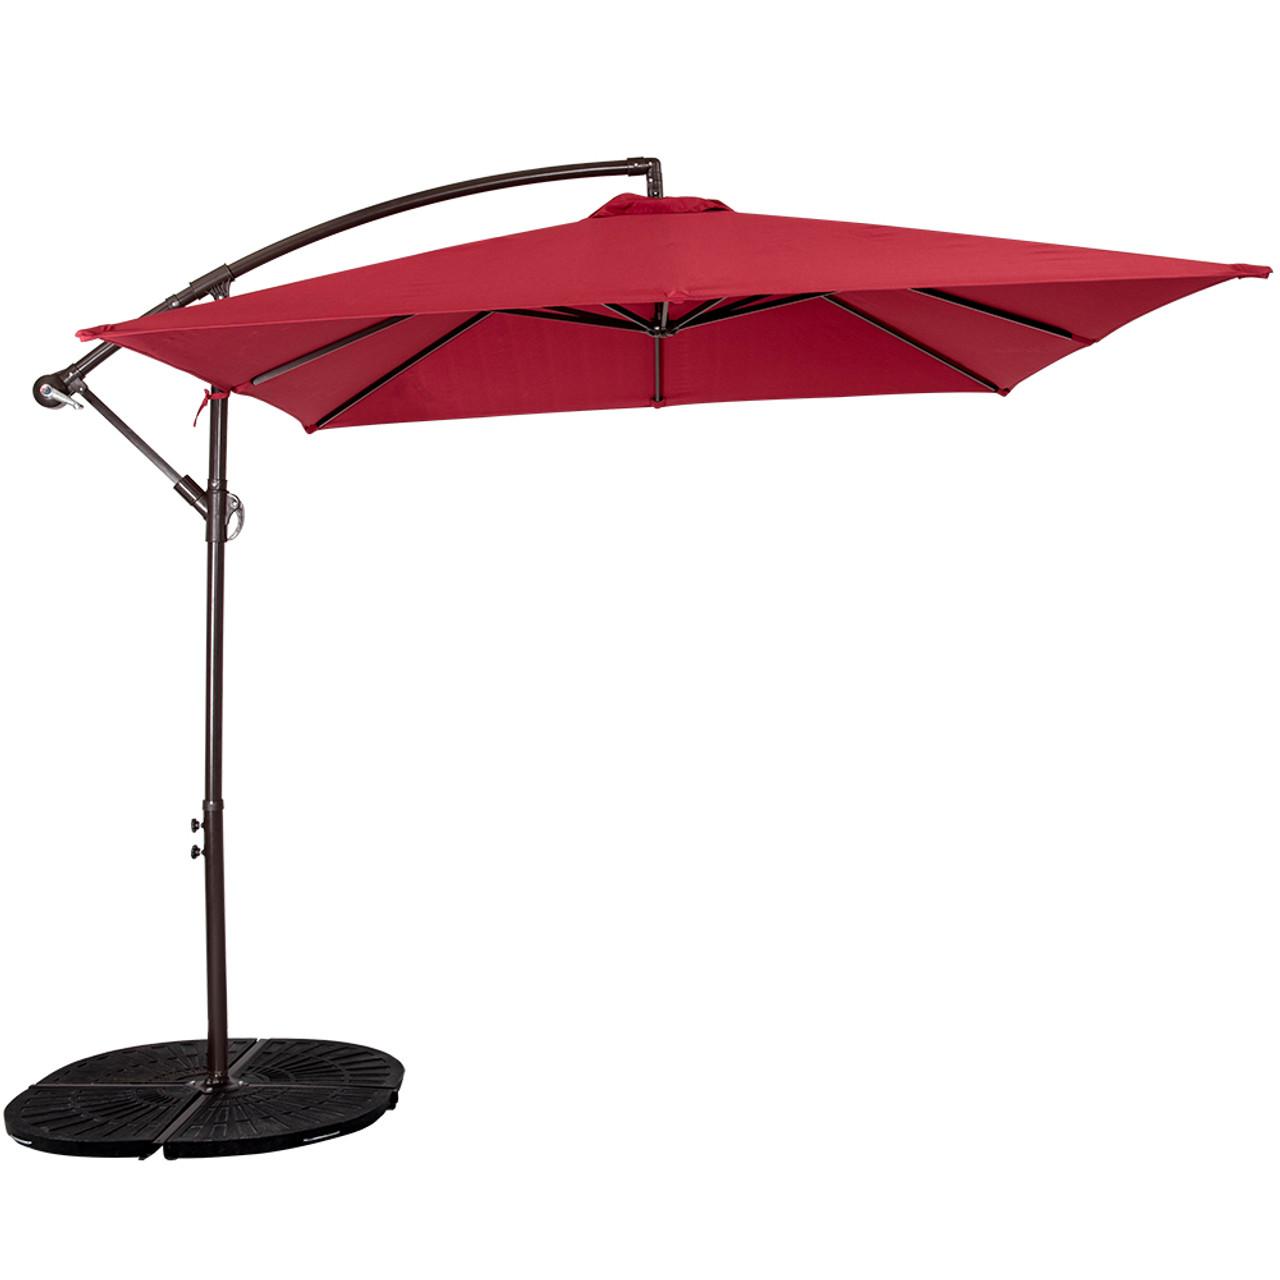 Patio Garden 82 x 82 FT Square Offset Patio Umbrella with Crank